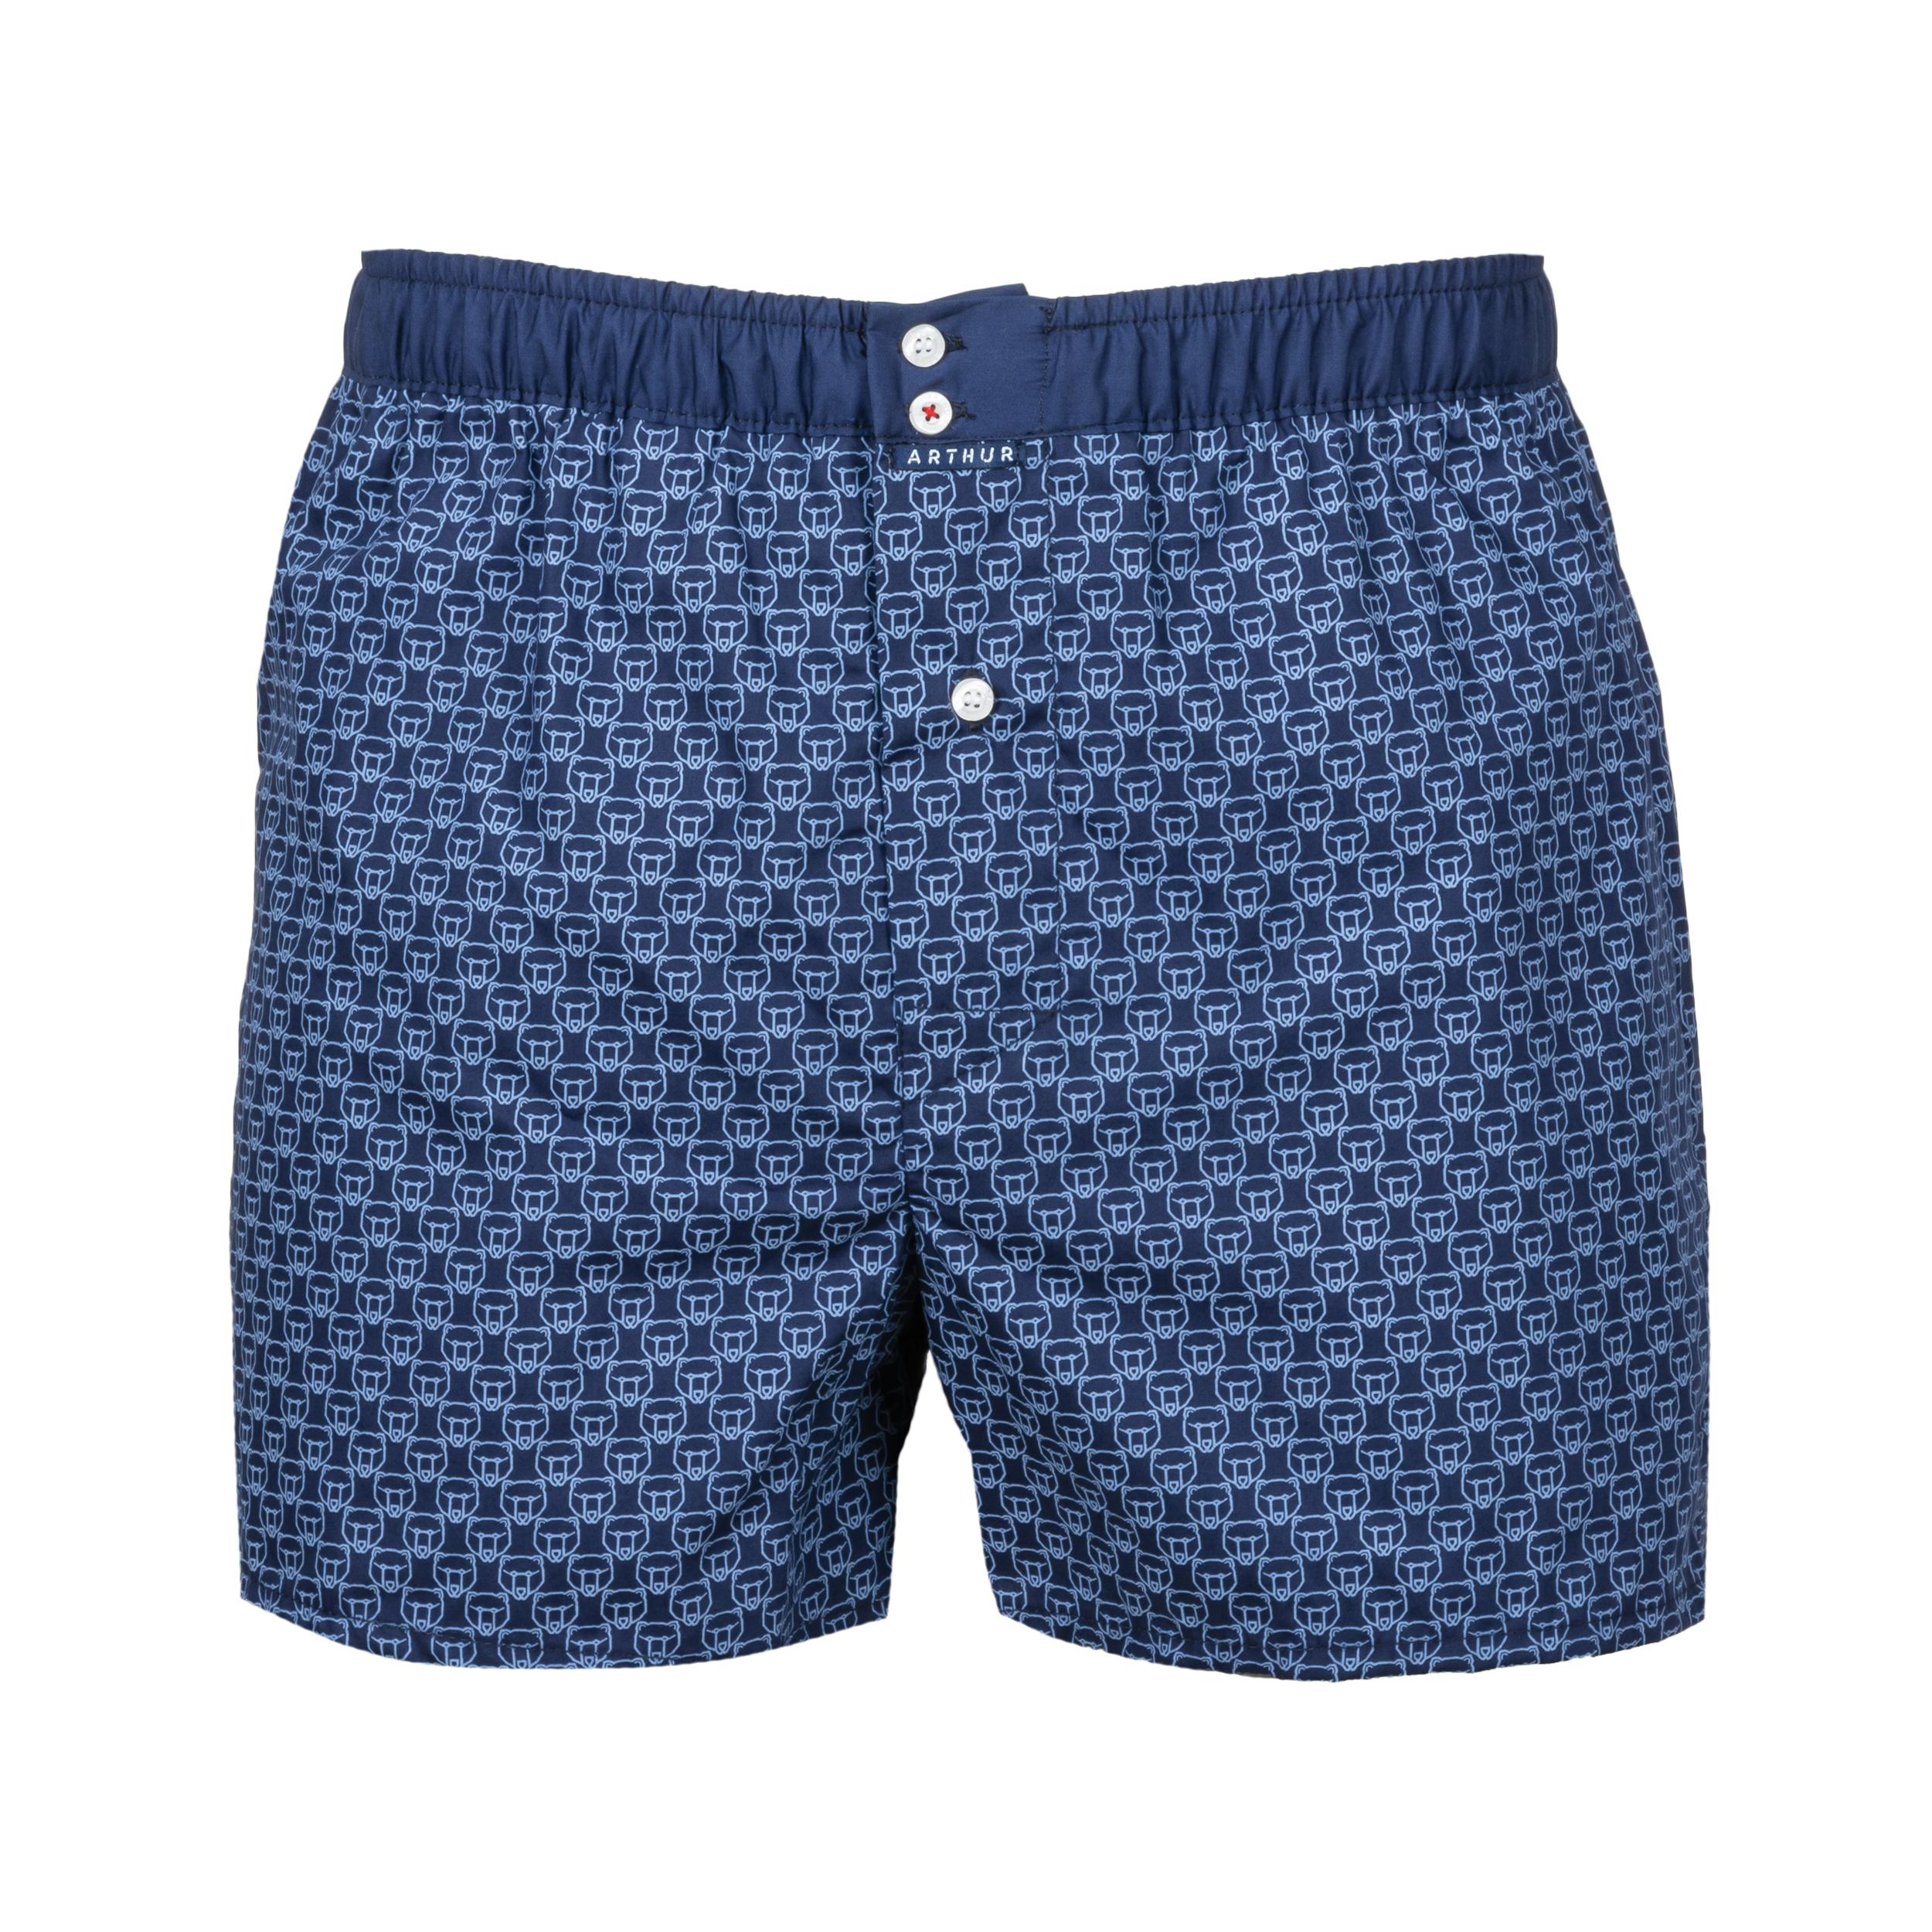 Caleçon  en coton bleu marine logotypé bleu ciel